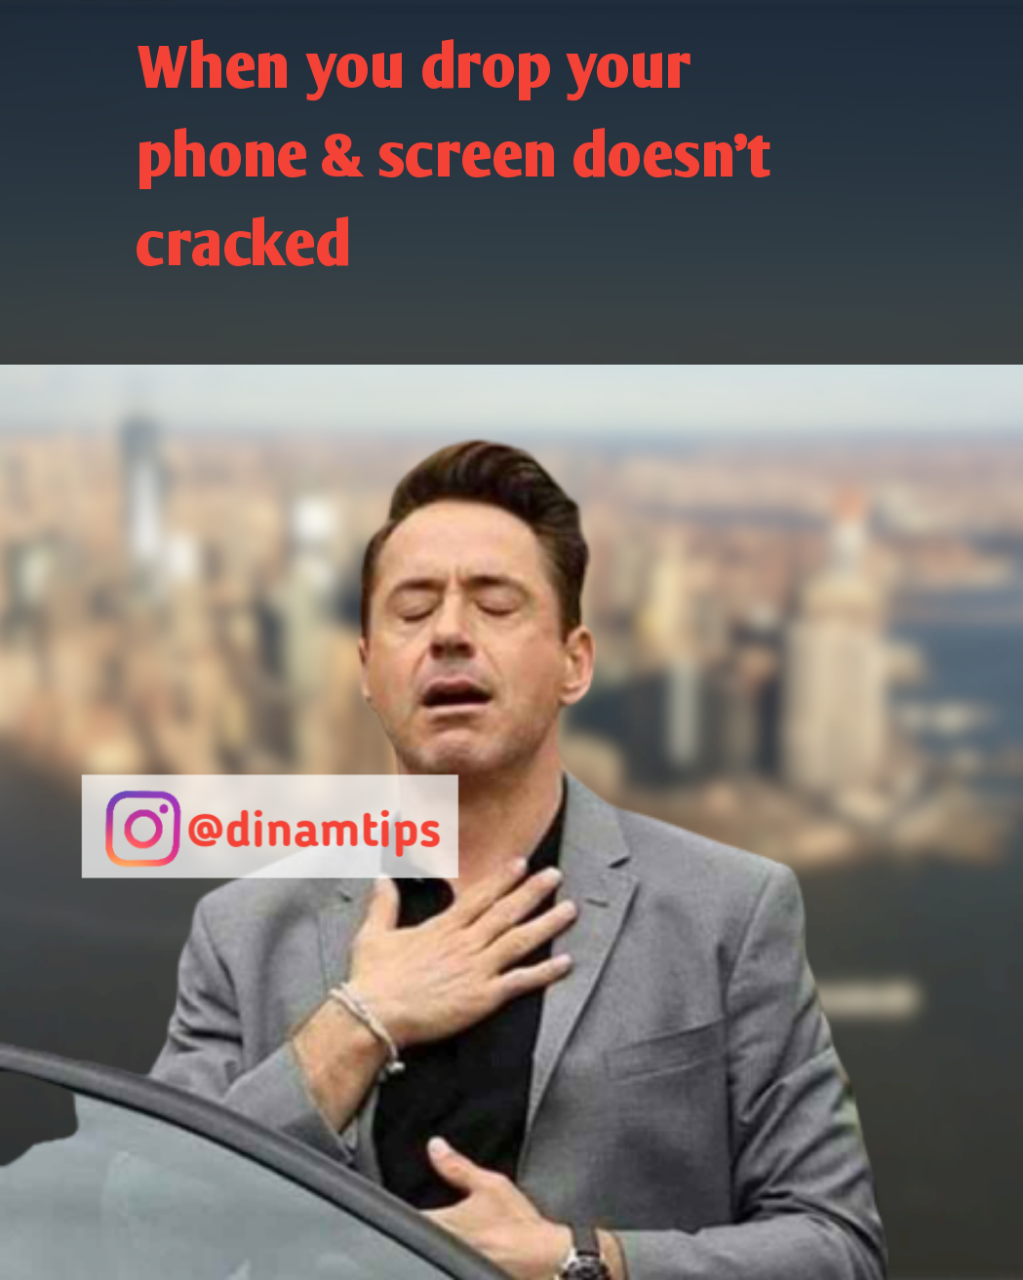 Memes Free Memes Memes Images Hindi Memes English Memes Funny Memes Memes English Memes